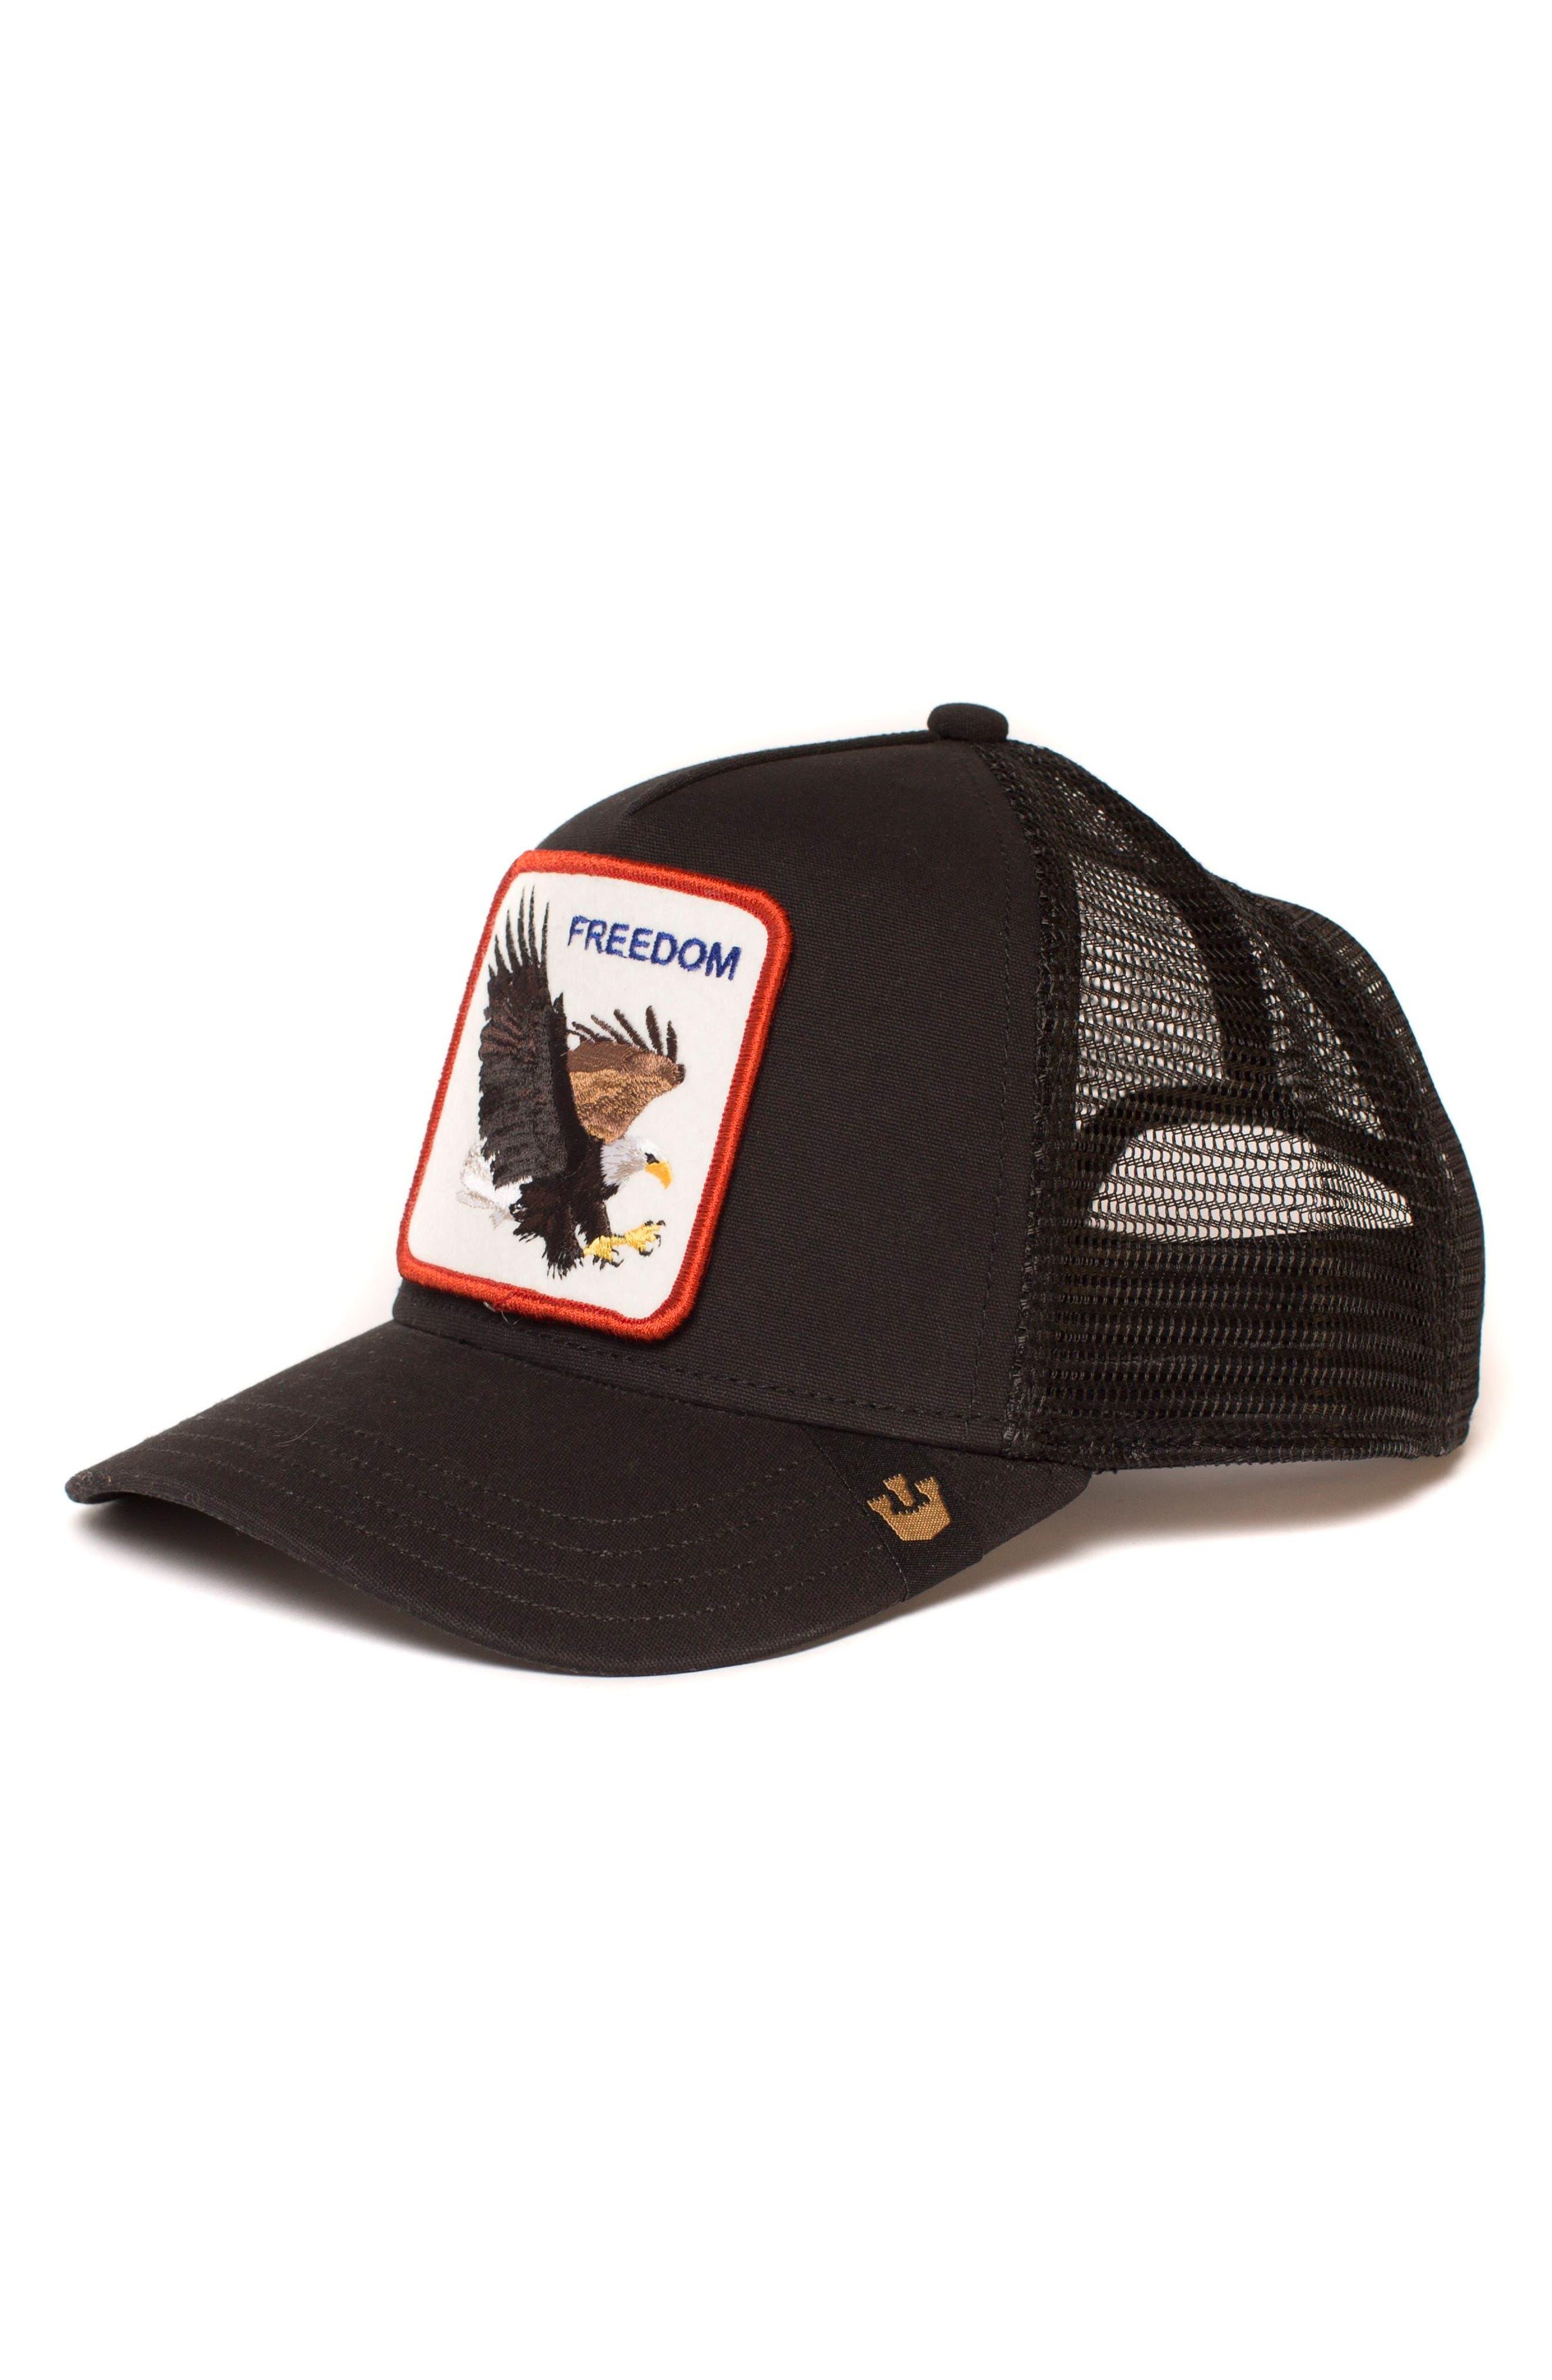 . Freedom Trucker Hat